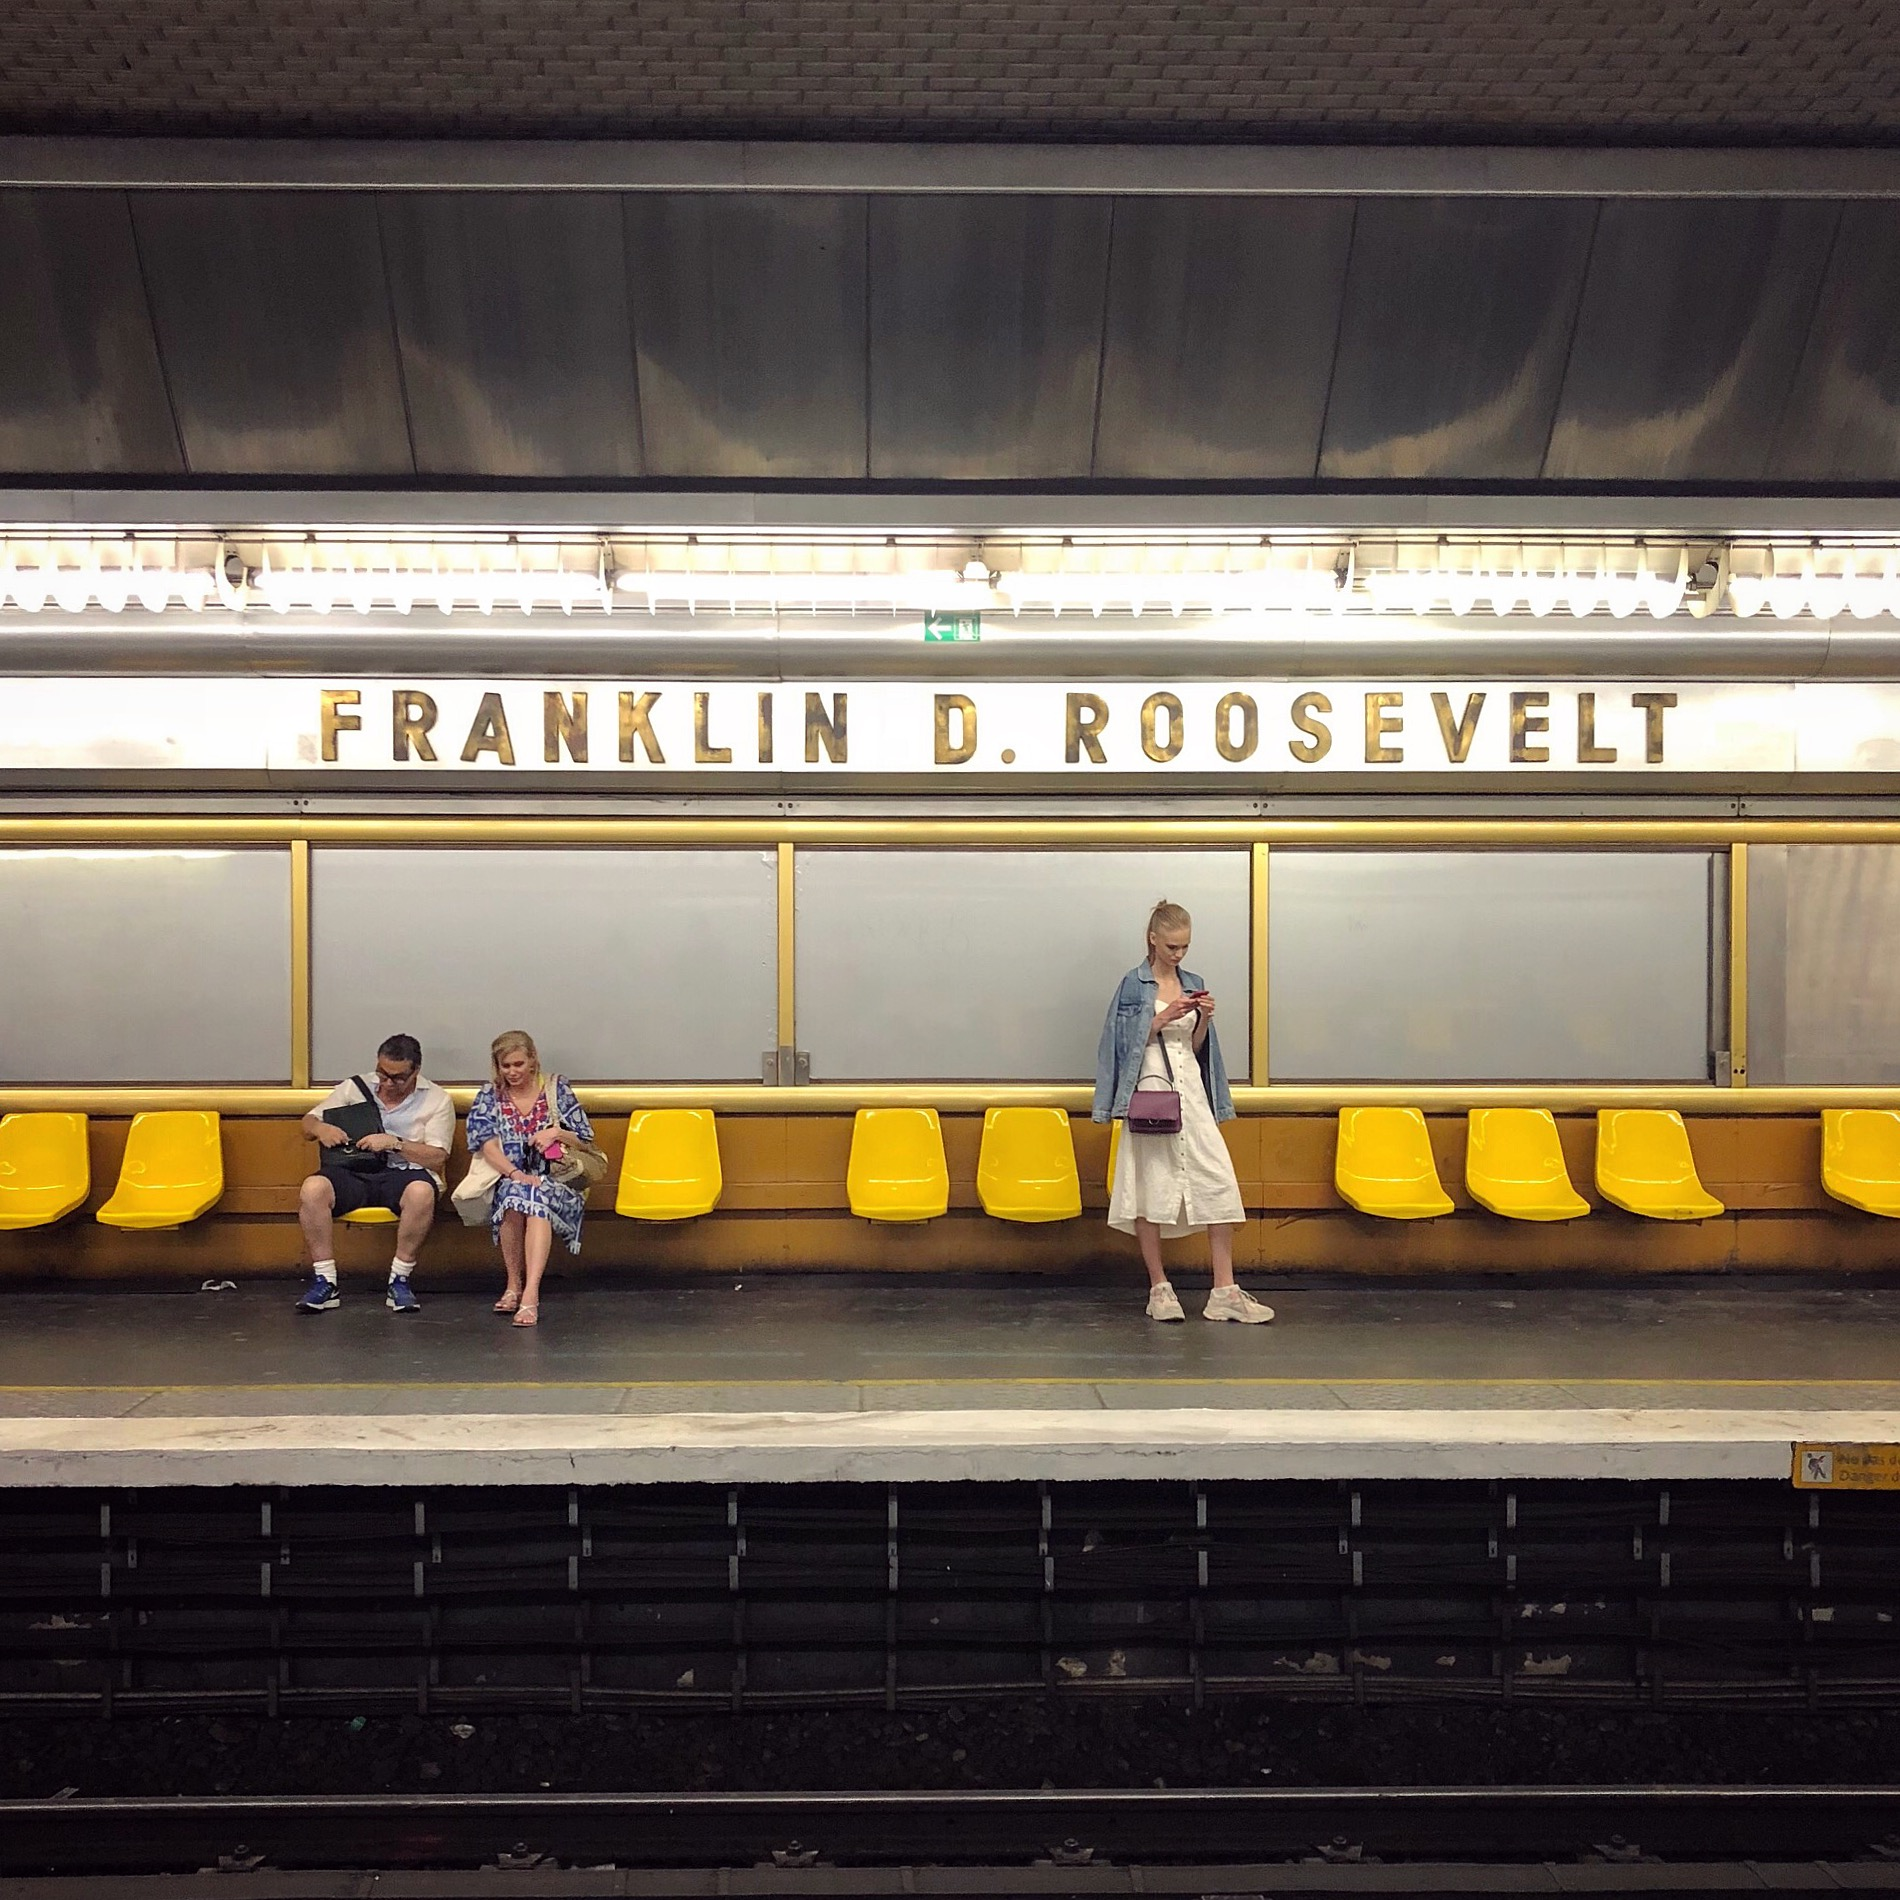 Paris' retro-picturesque Franklin D. Roosevelt metro station